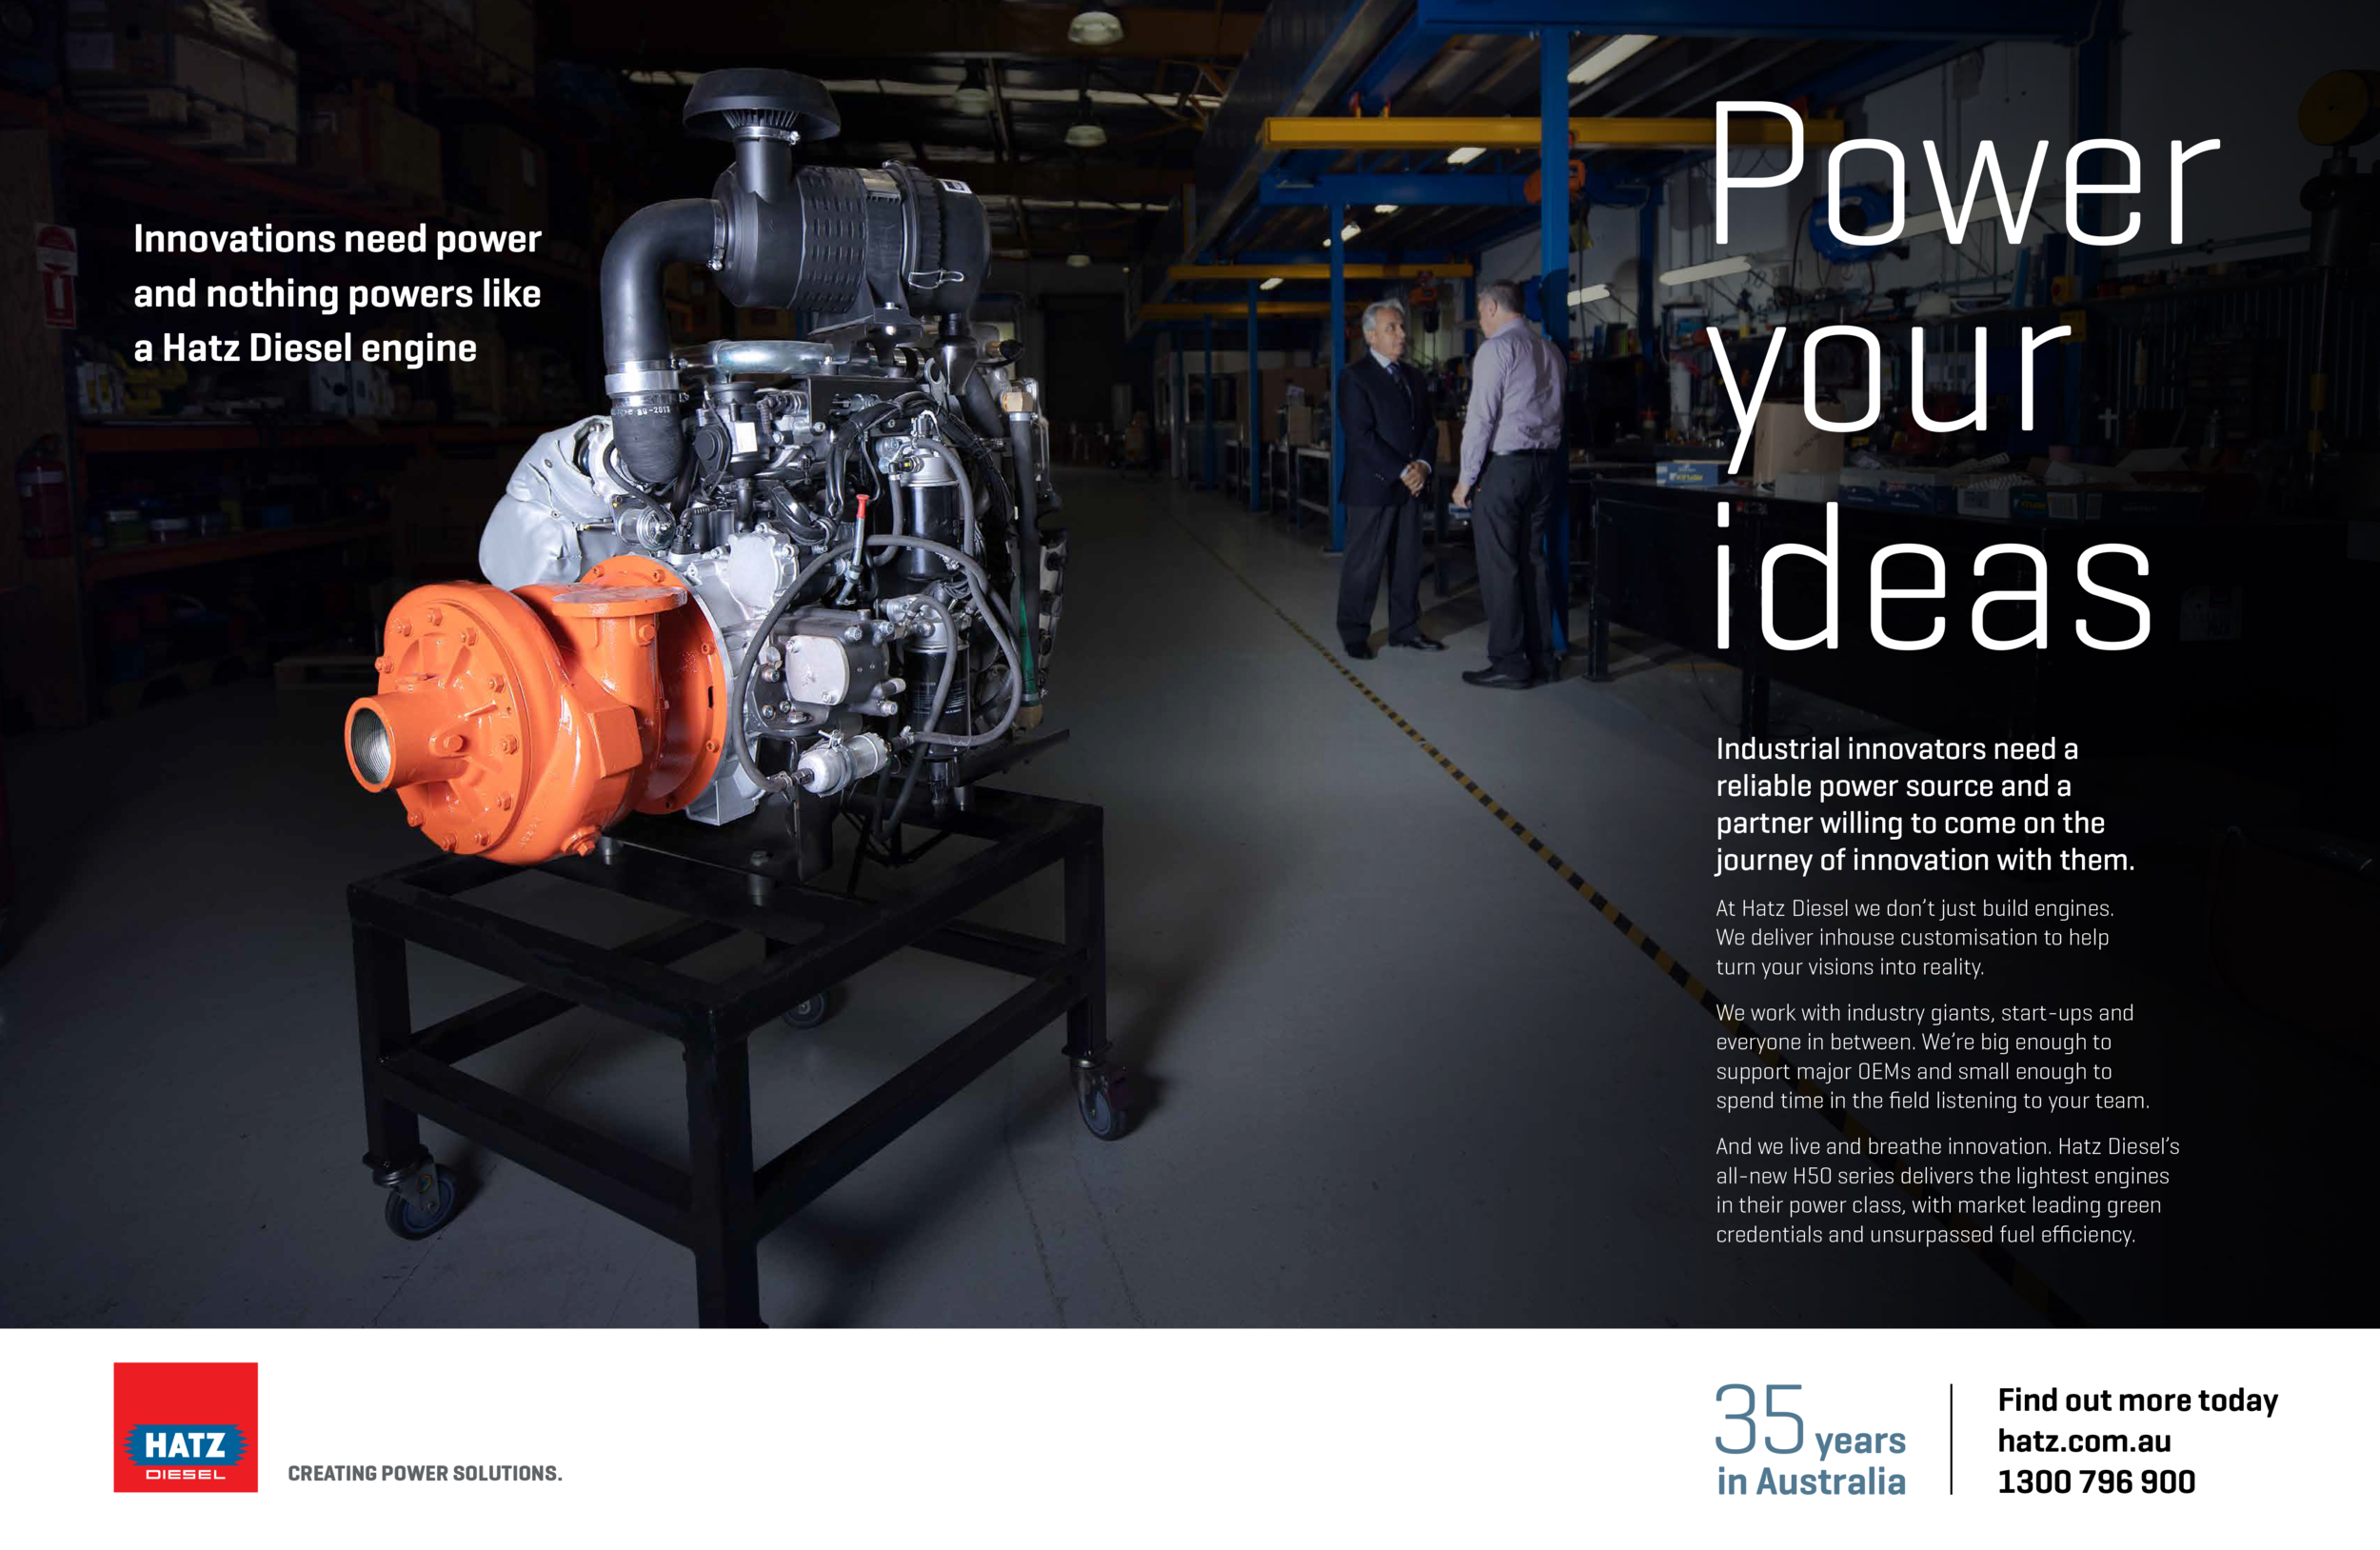 J17475 - Hatz Diesel CEO magazine ad v3 LR.png